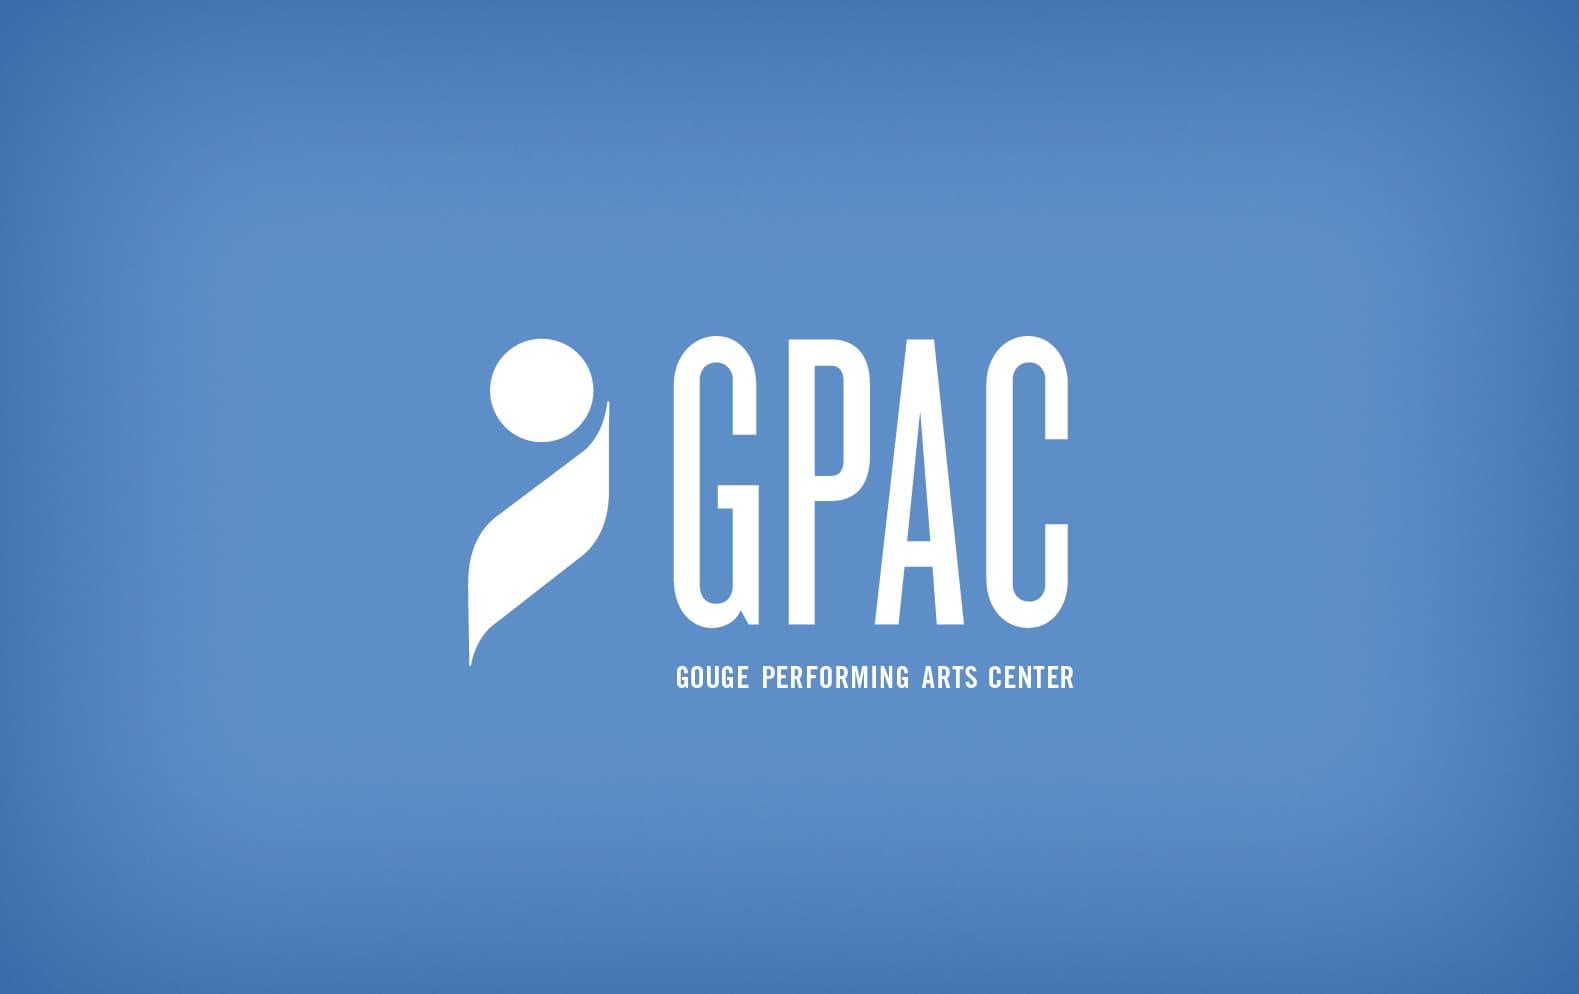 GPAC Logo in white